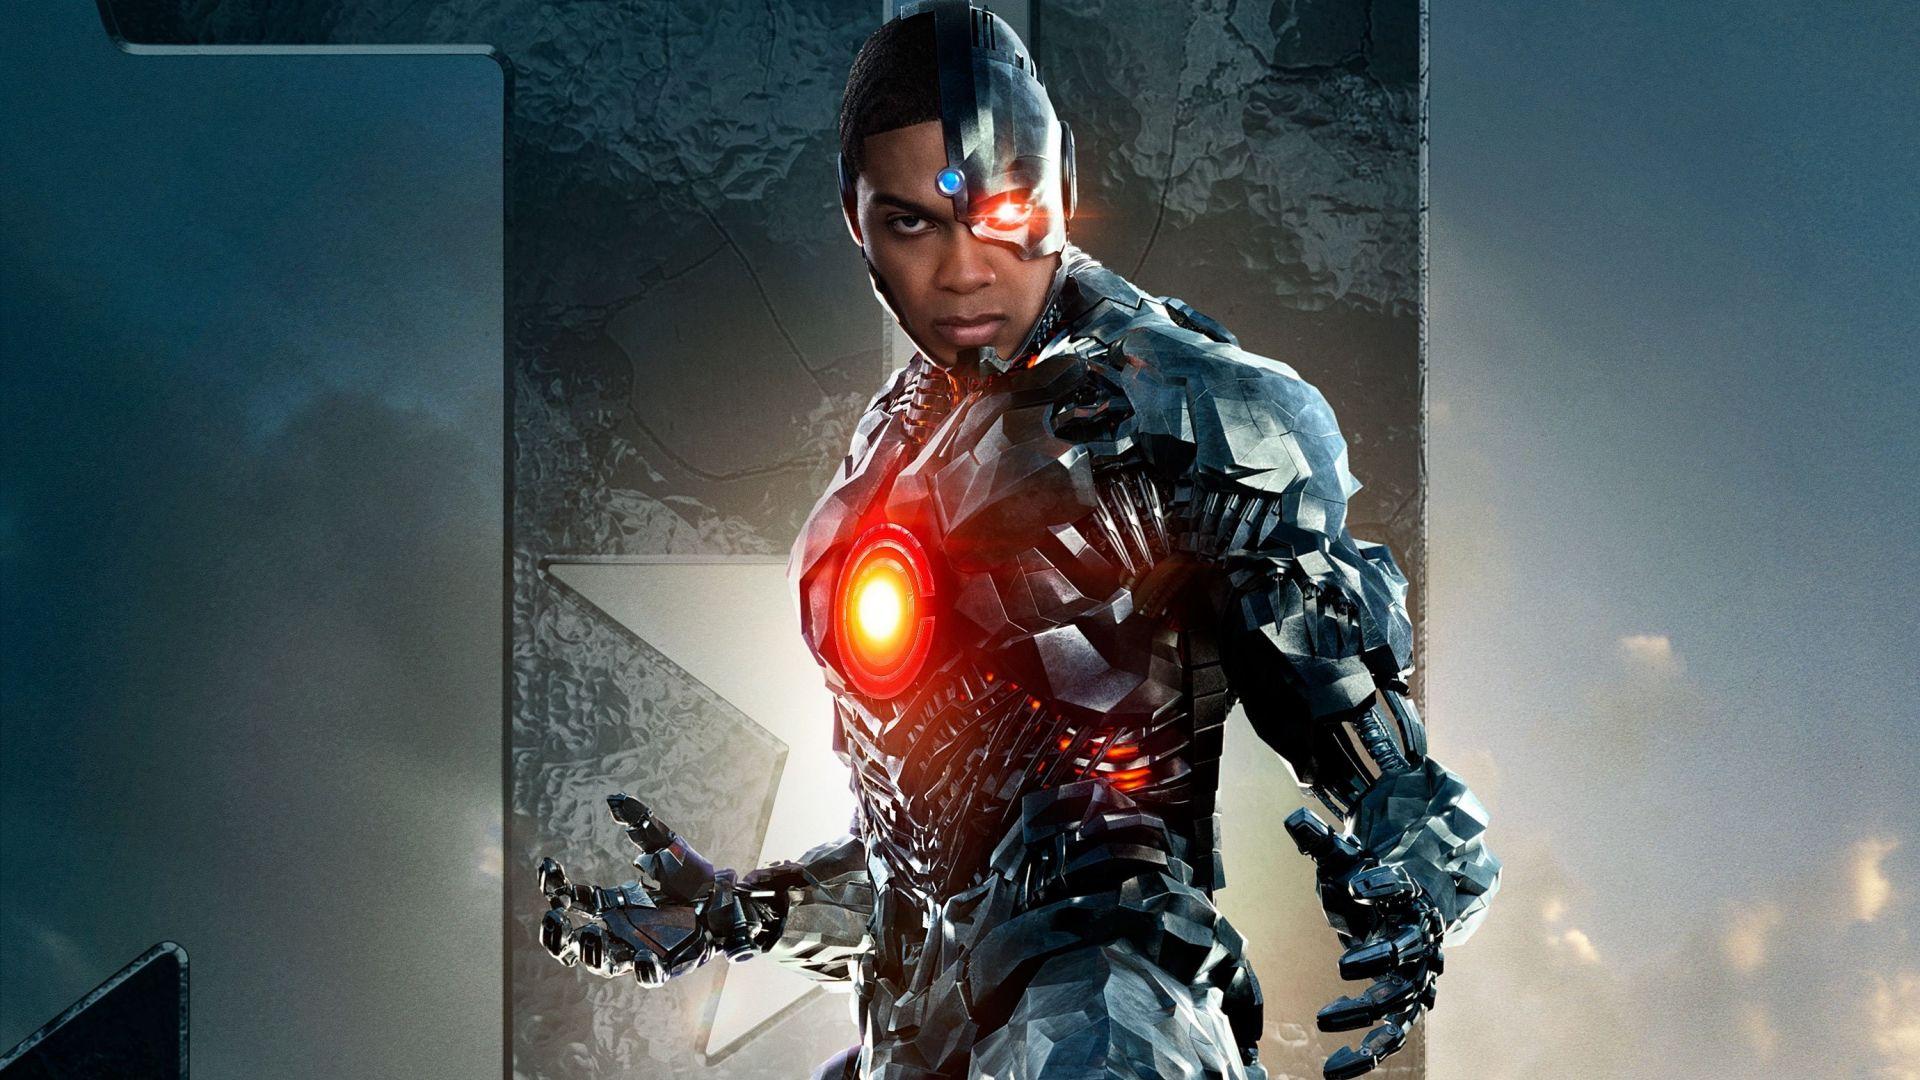 Wallpaper Cyborg, Justice League, 2017 movie, Ray Fisher, superhero